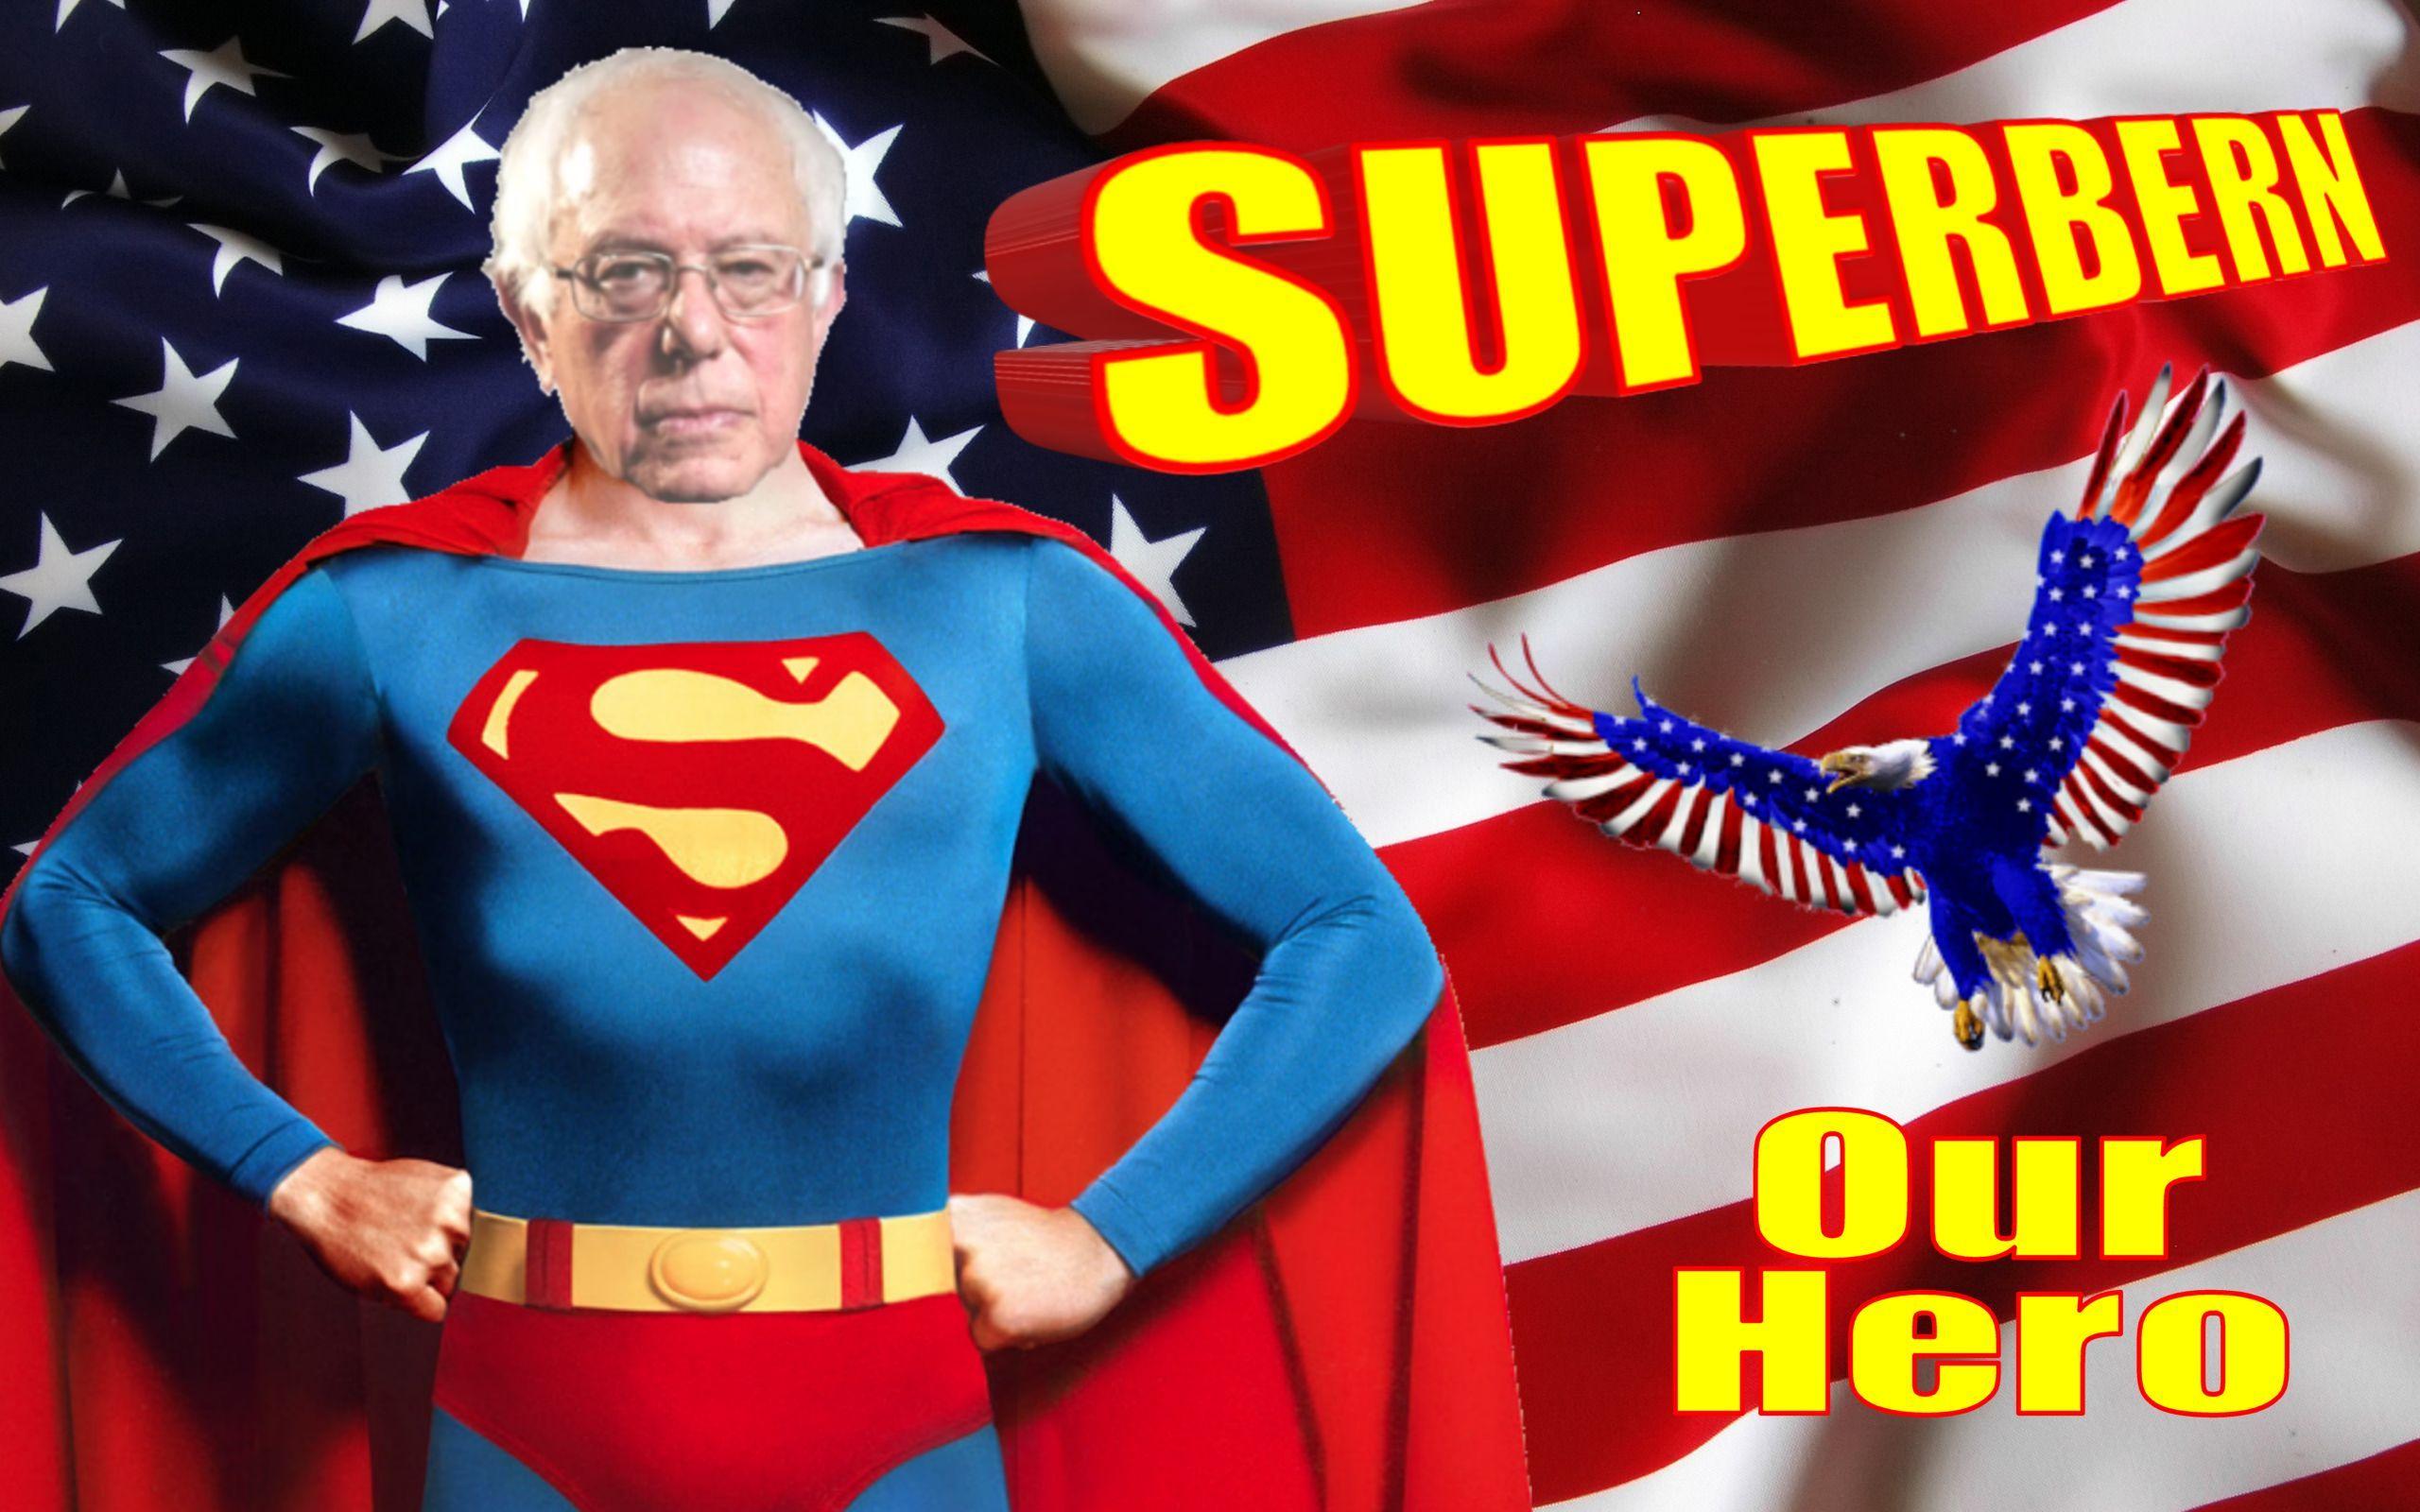 Bernie Sanders Superman Superman Hero That S What She Said